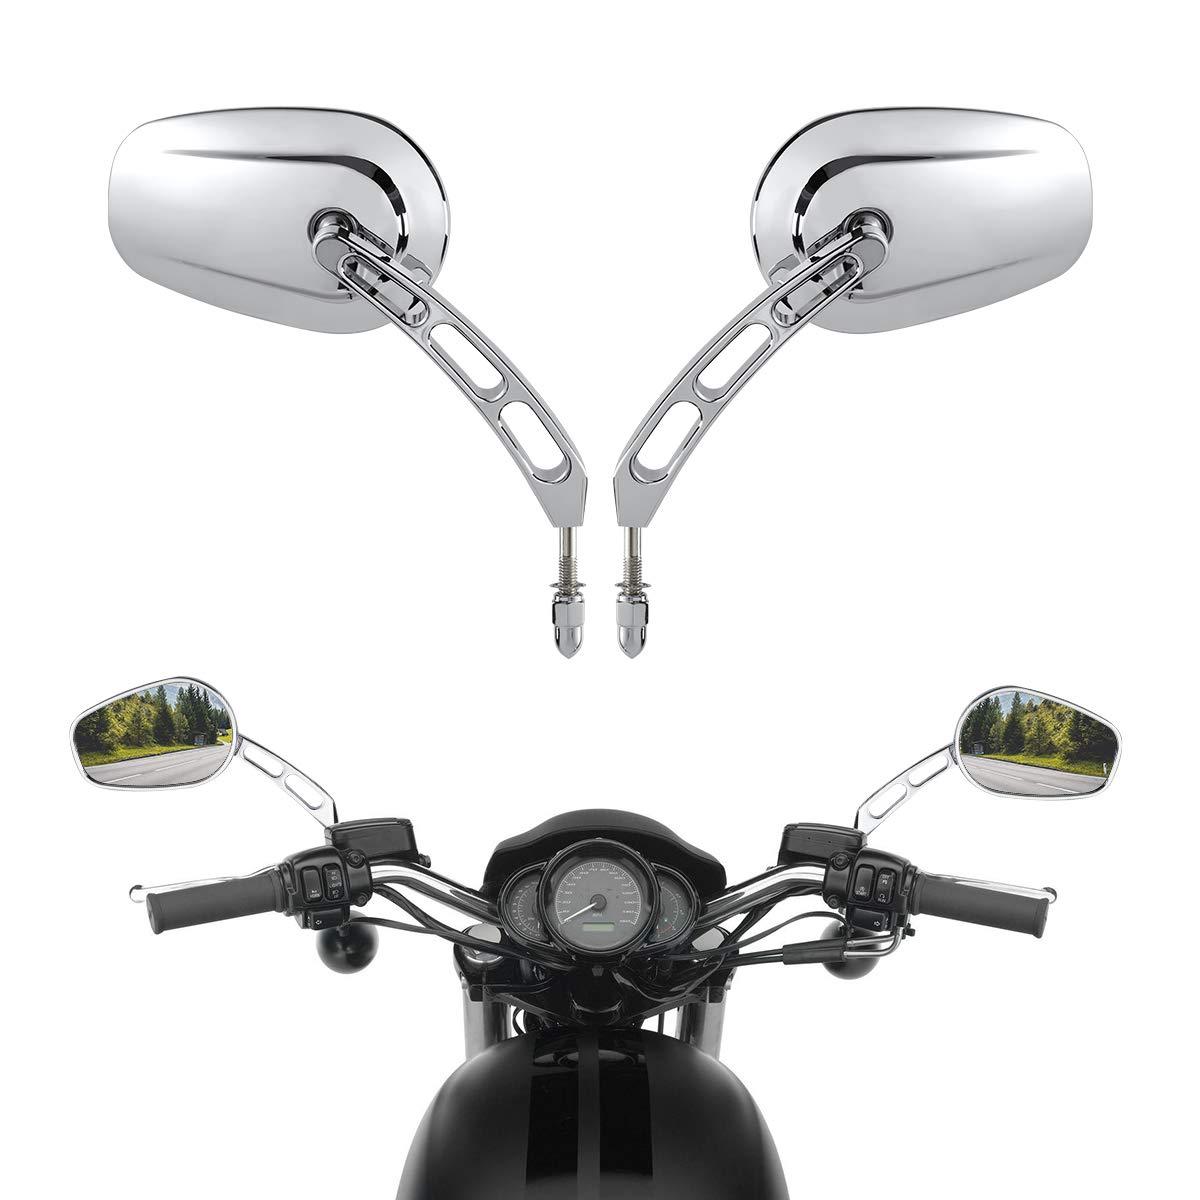 XMT-MOTOR Moto 8mm Espejo Retrovisor Adecuado para Harley Davidson Touring Softail FL Dyna Sportster 883 Cromo